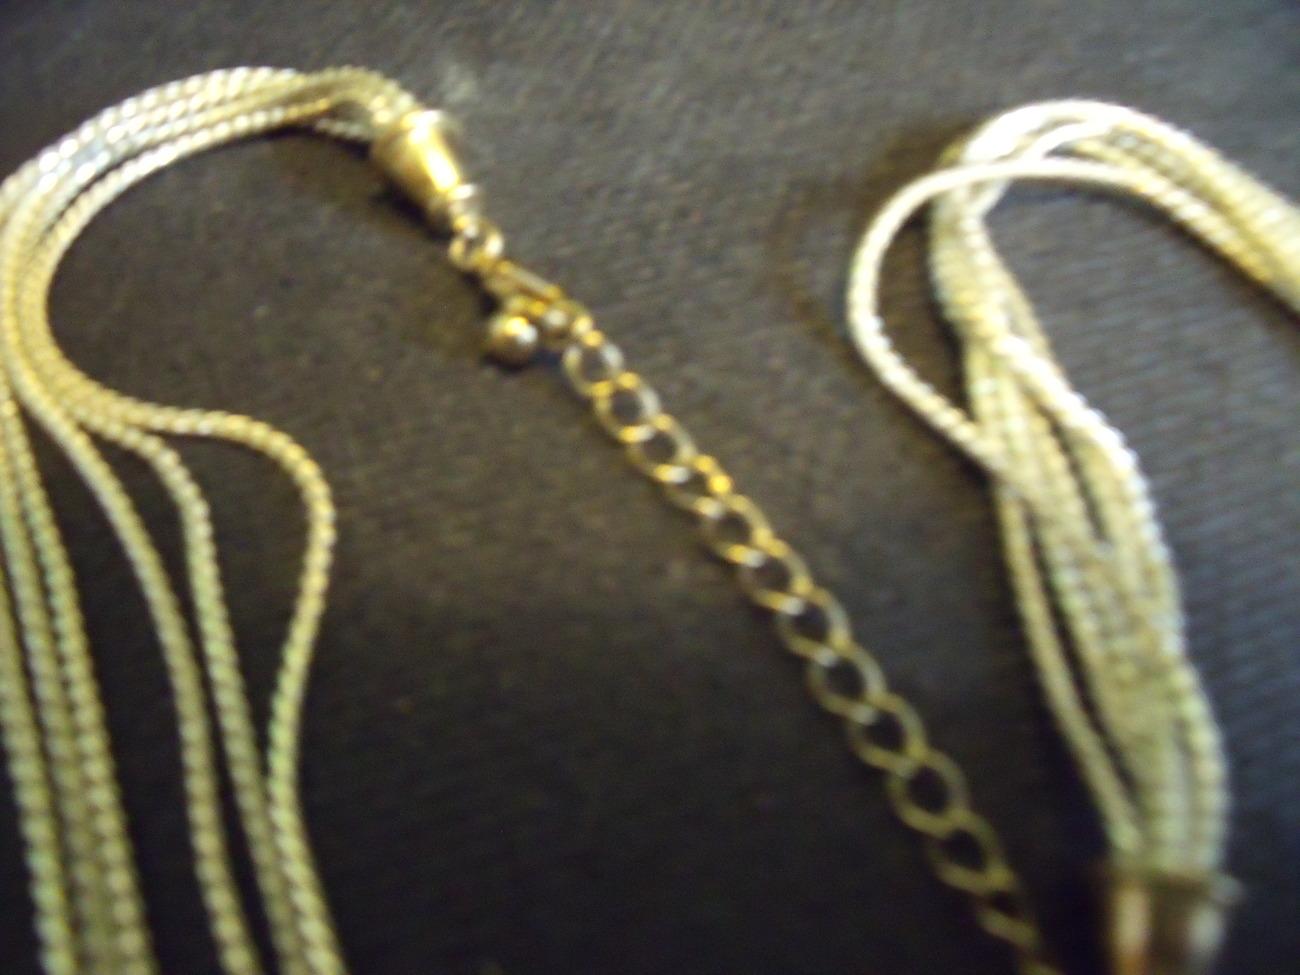 Two Tone Muti Strand Necklace